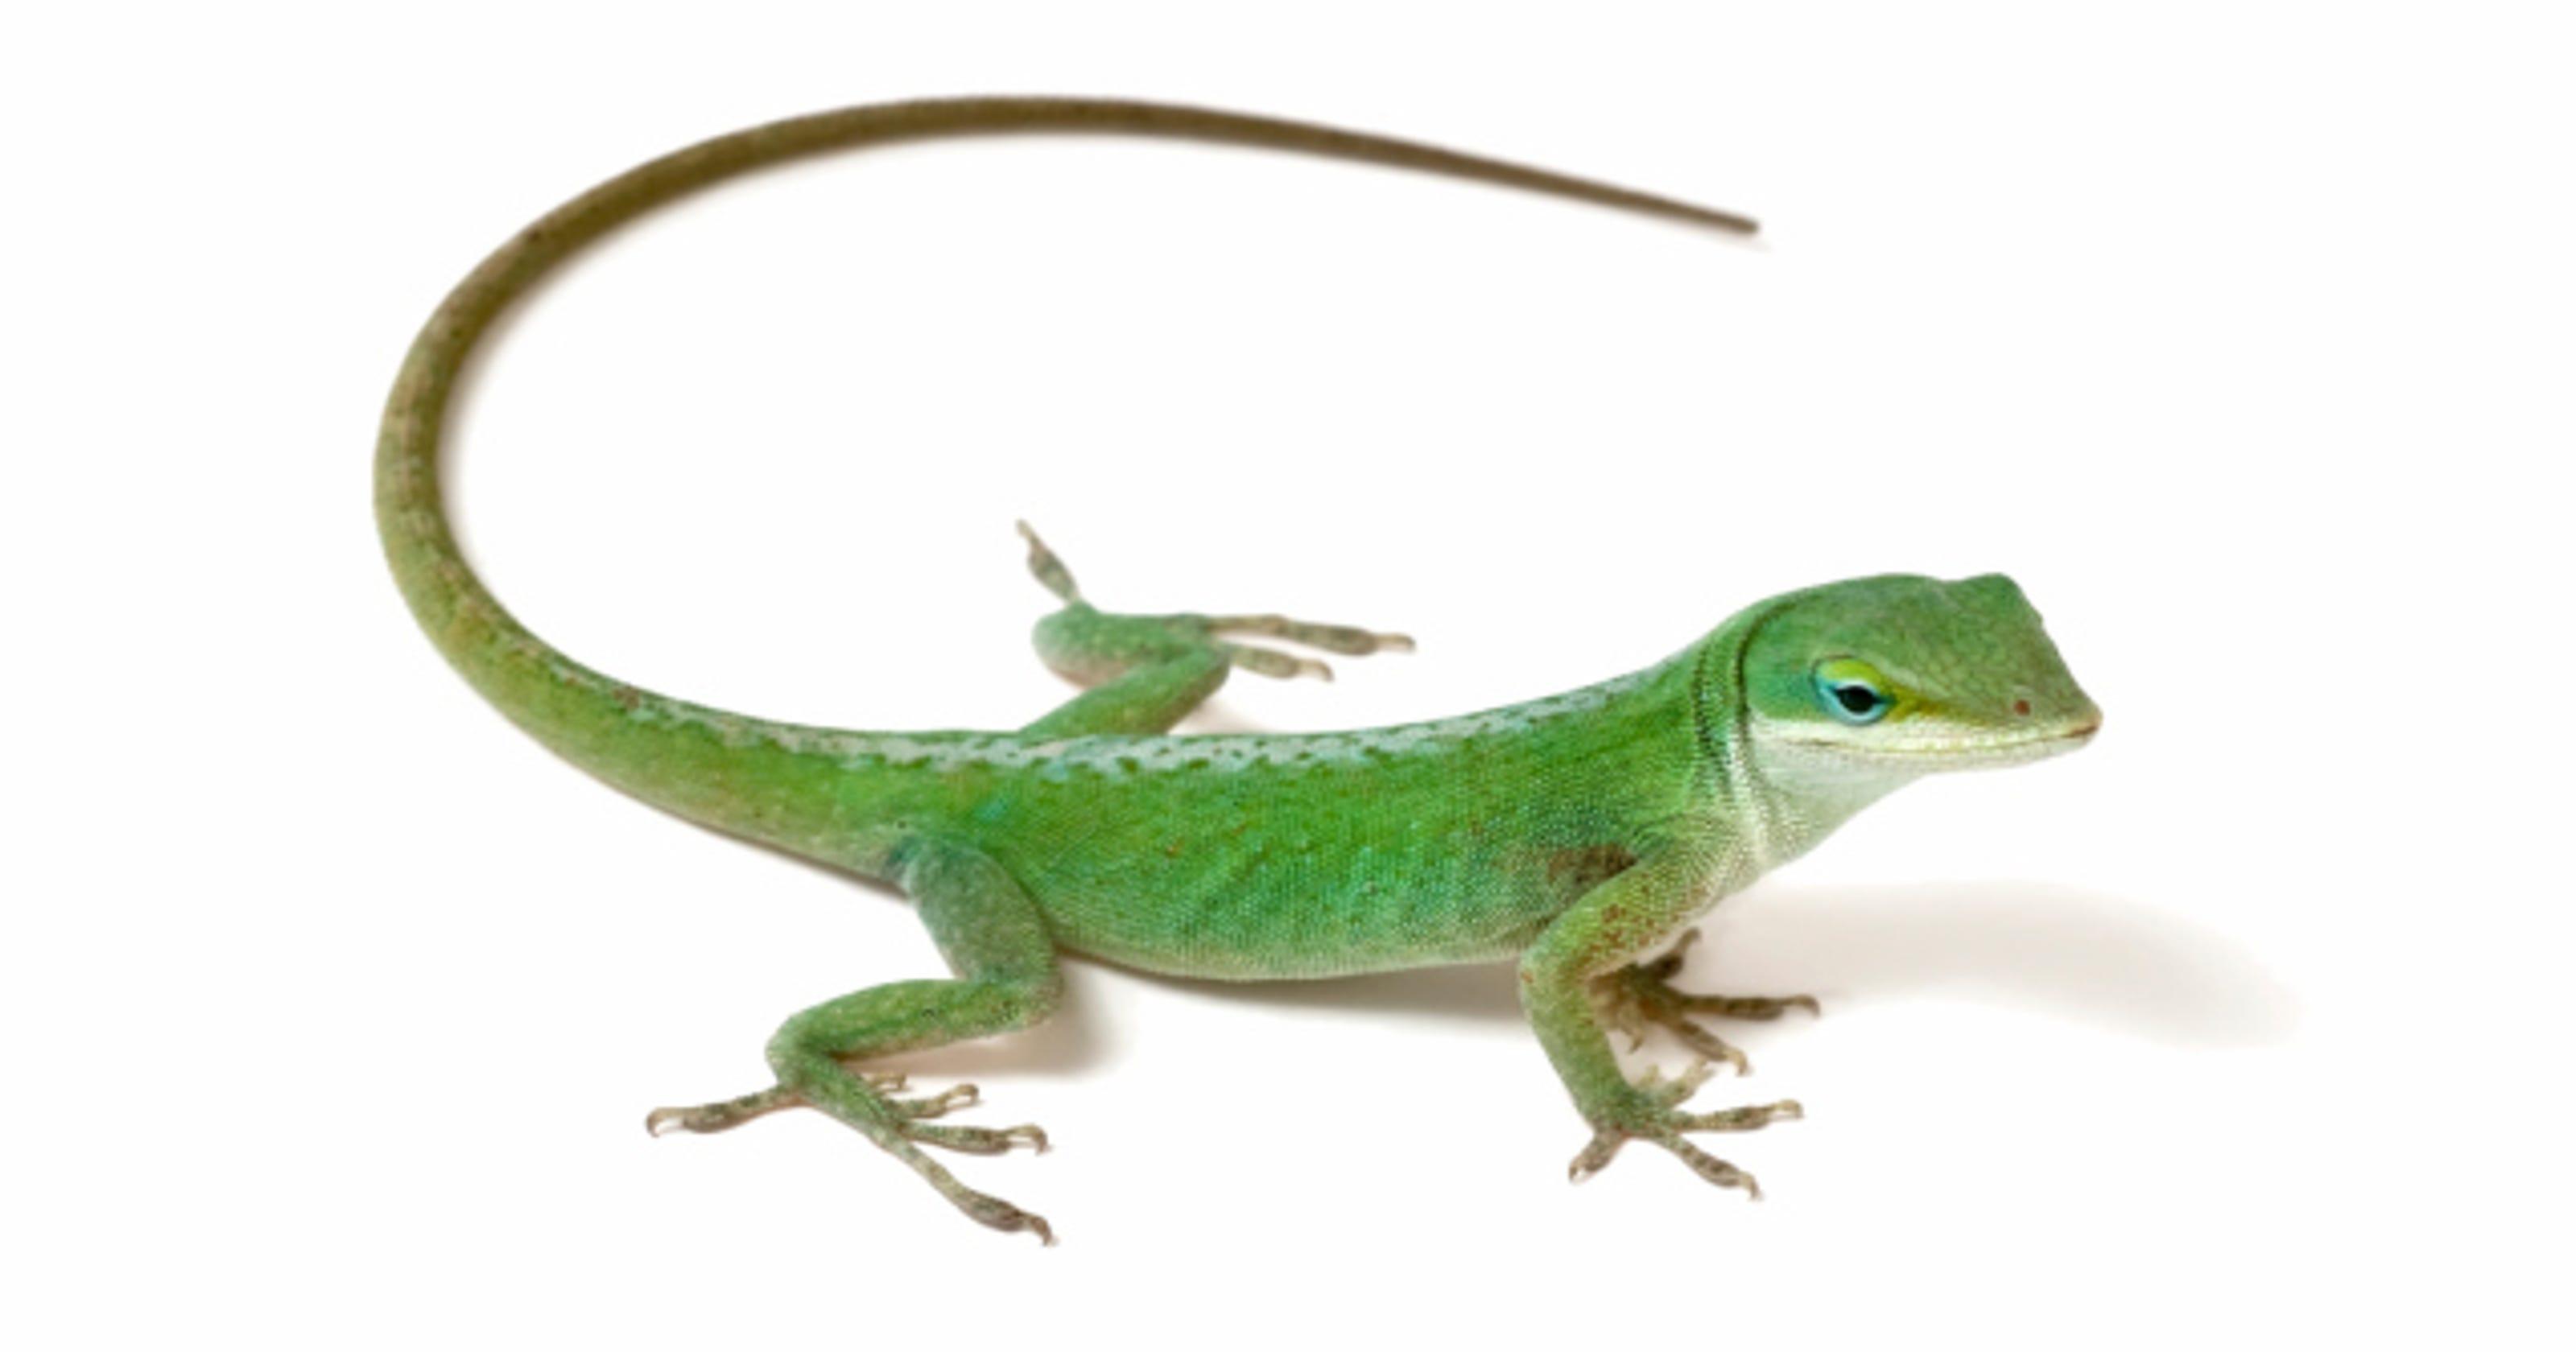 Do lizards hold key to human-limb regeneration?